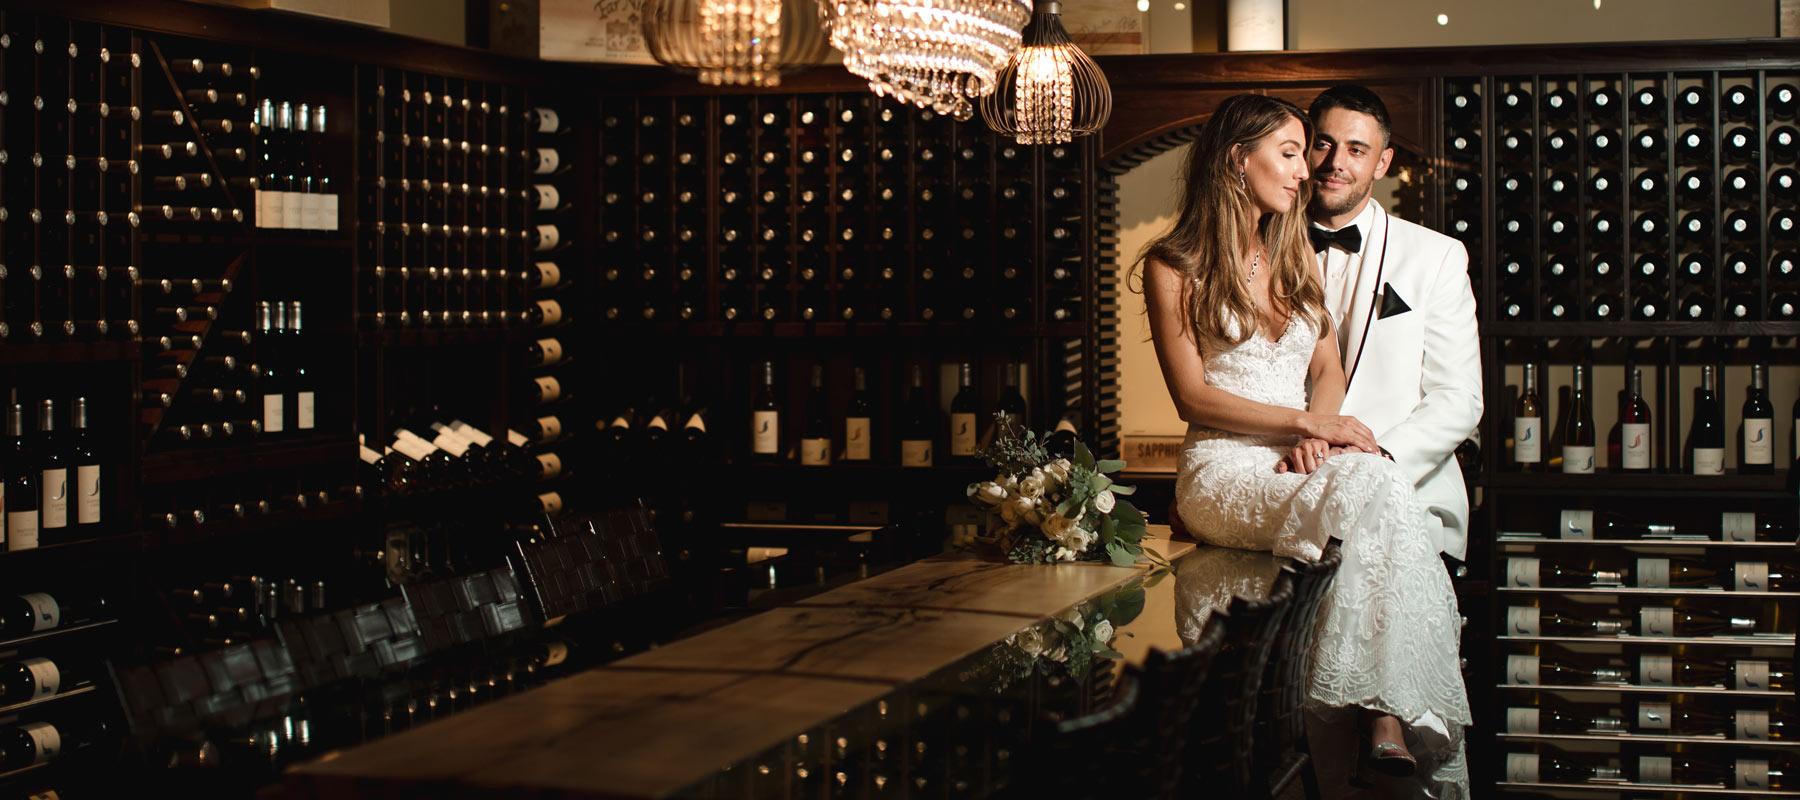 Chelsey + Cody // Partners in Wine